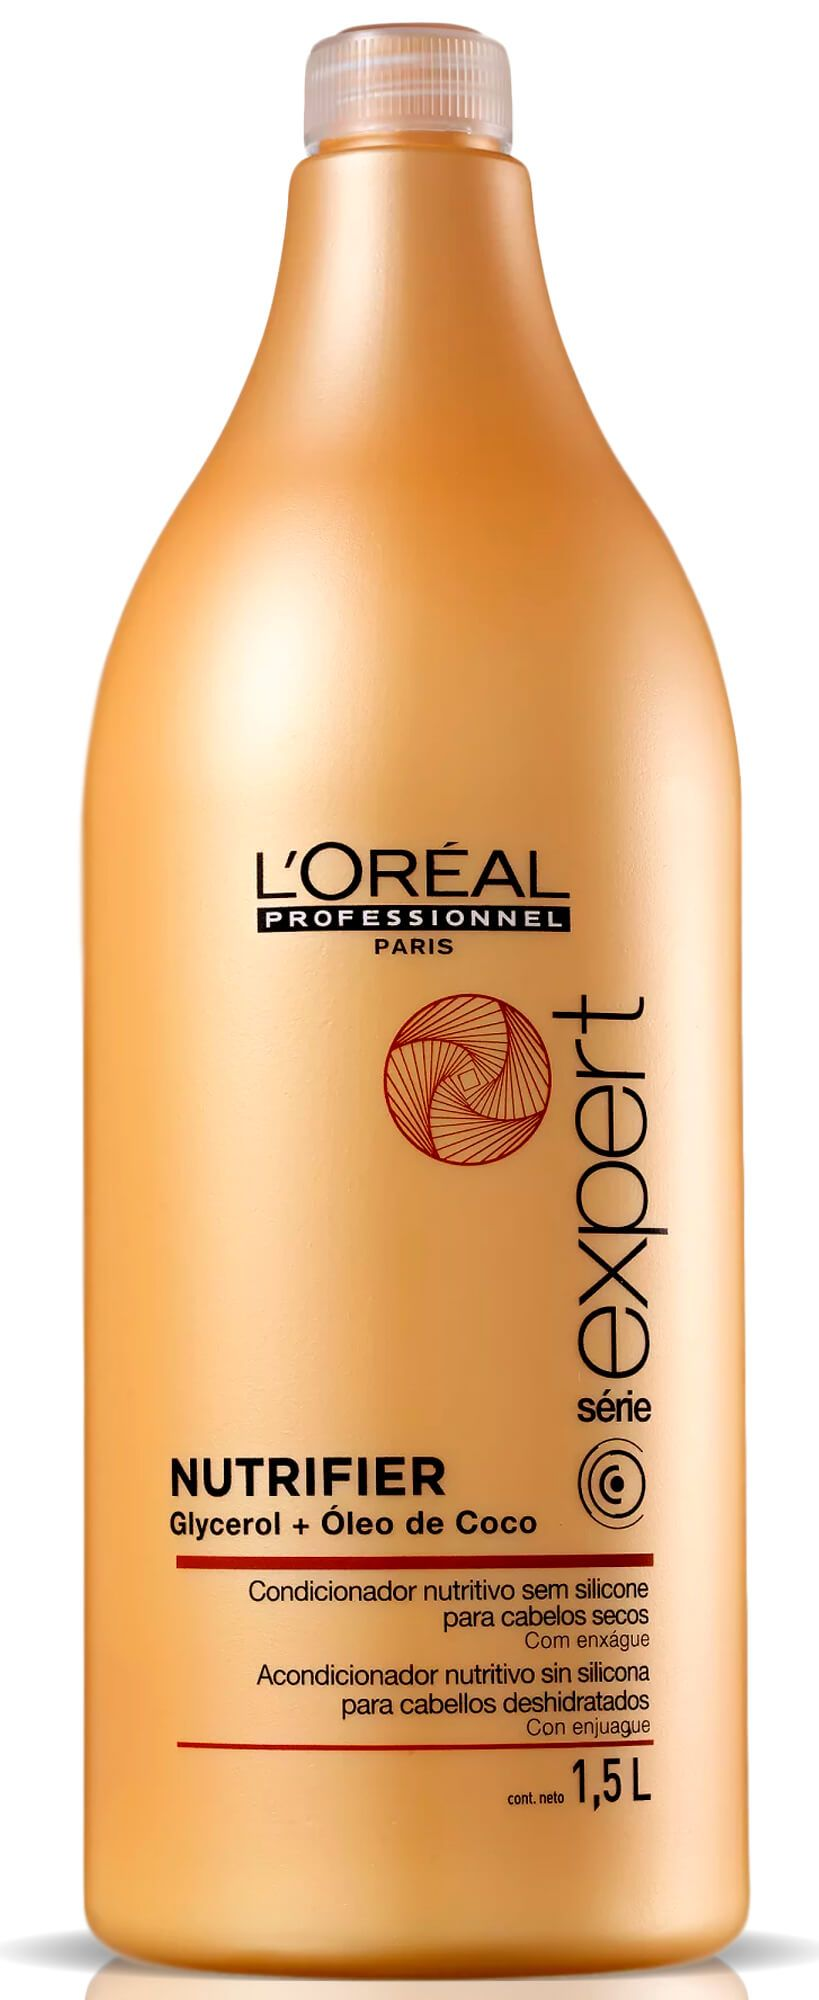 Condicionador L'oréal Professionnel Nutrifier - 1500ml